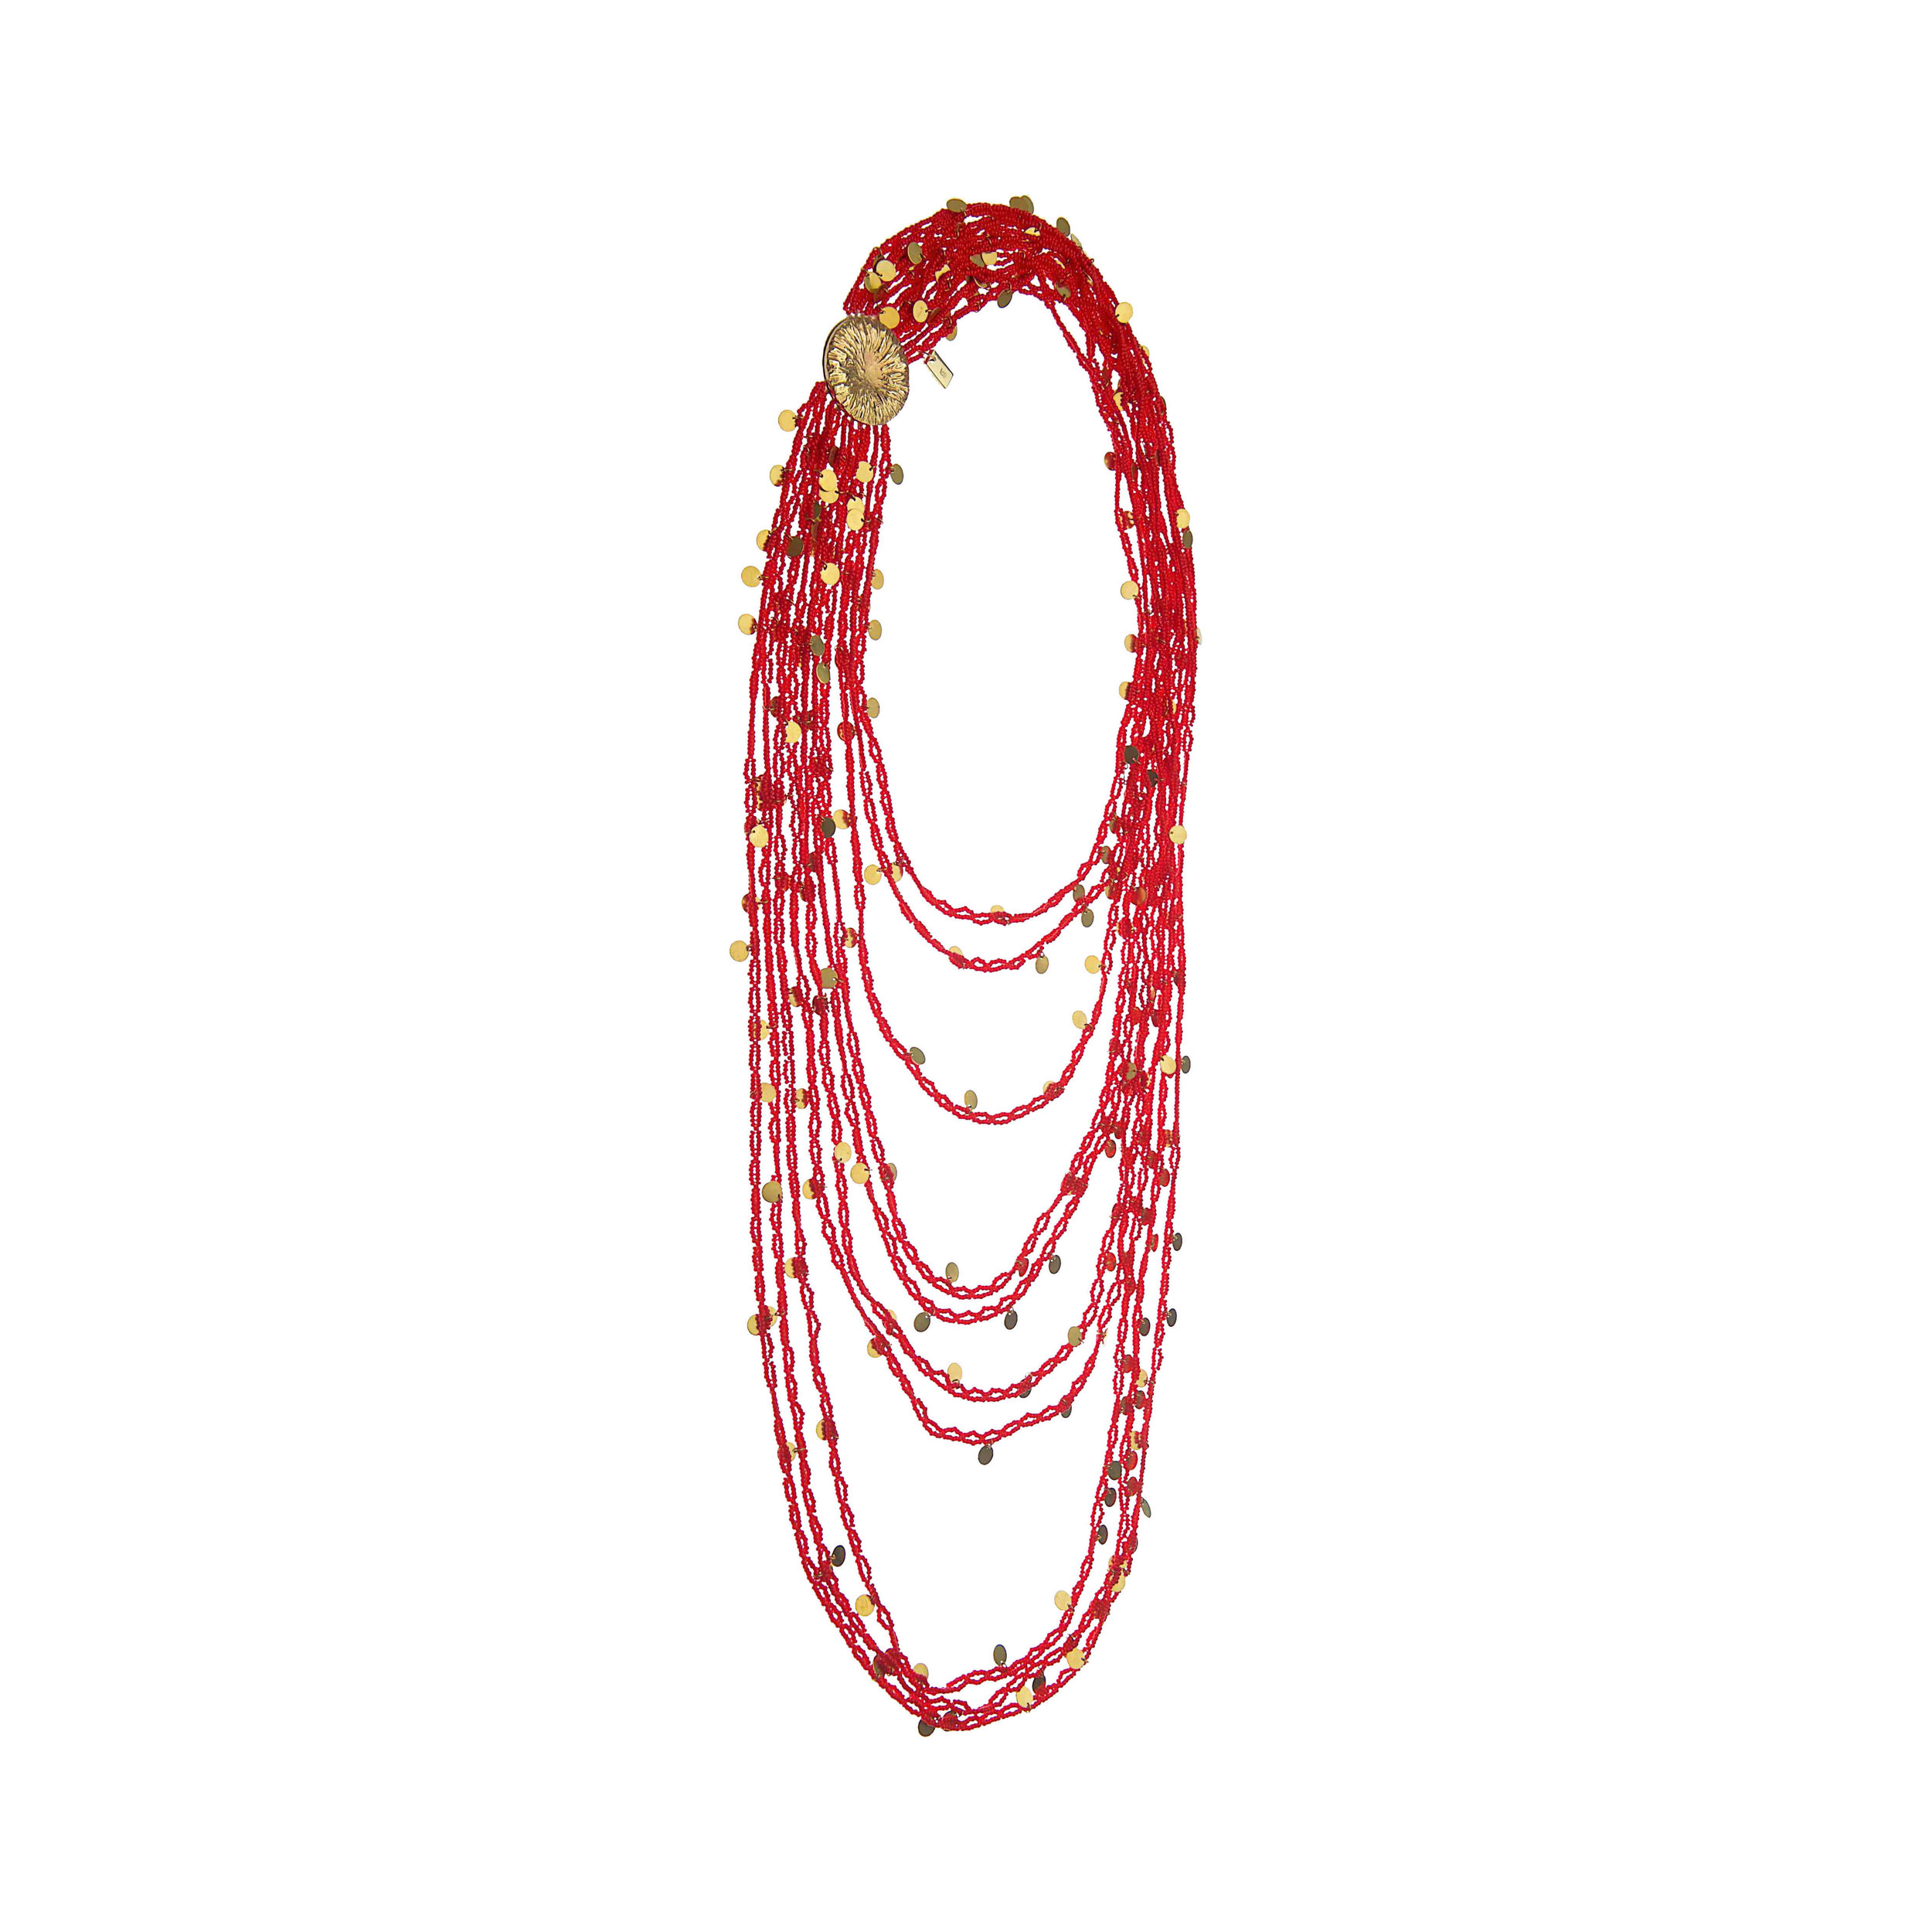 AAV 5 RED